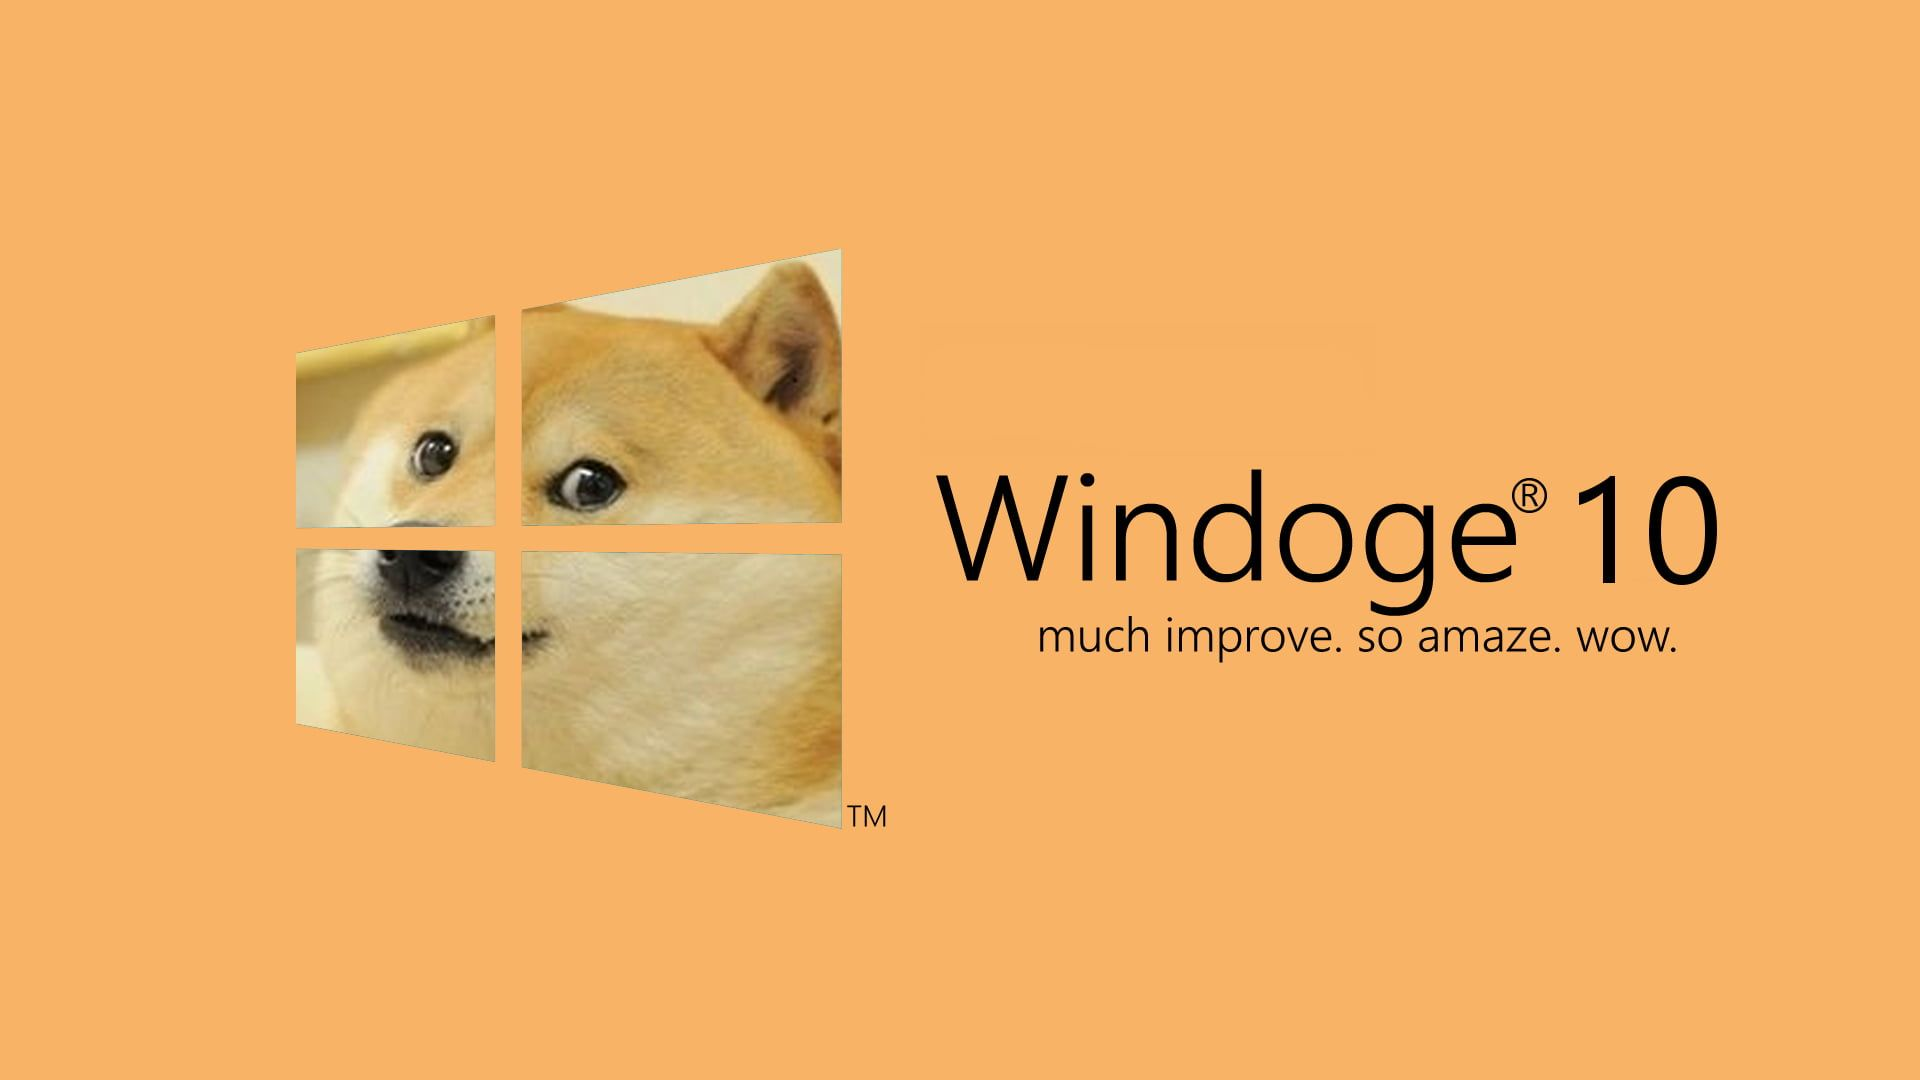 Windoge 10 Logo Microsoft Windows Windows 10 Memes Text Colored Background Doge Meme Very Funny Memes Funny Doge